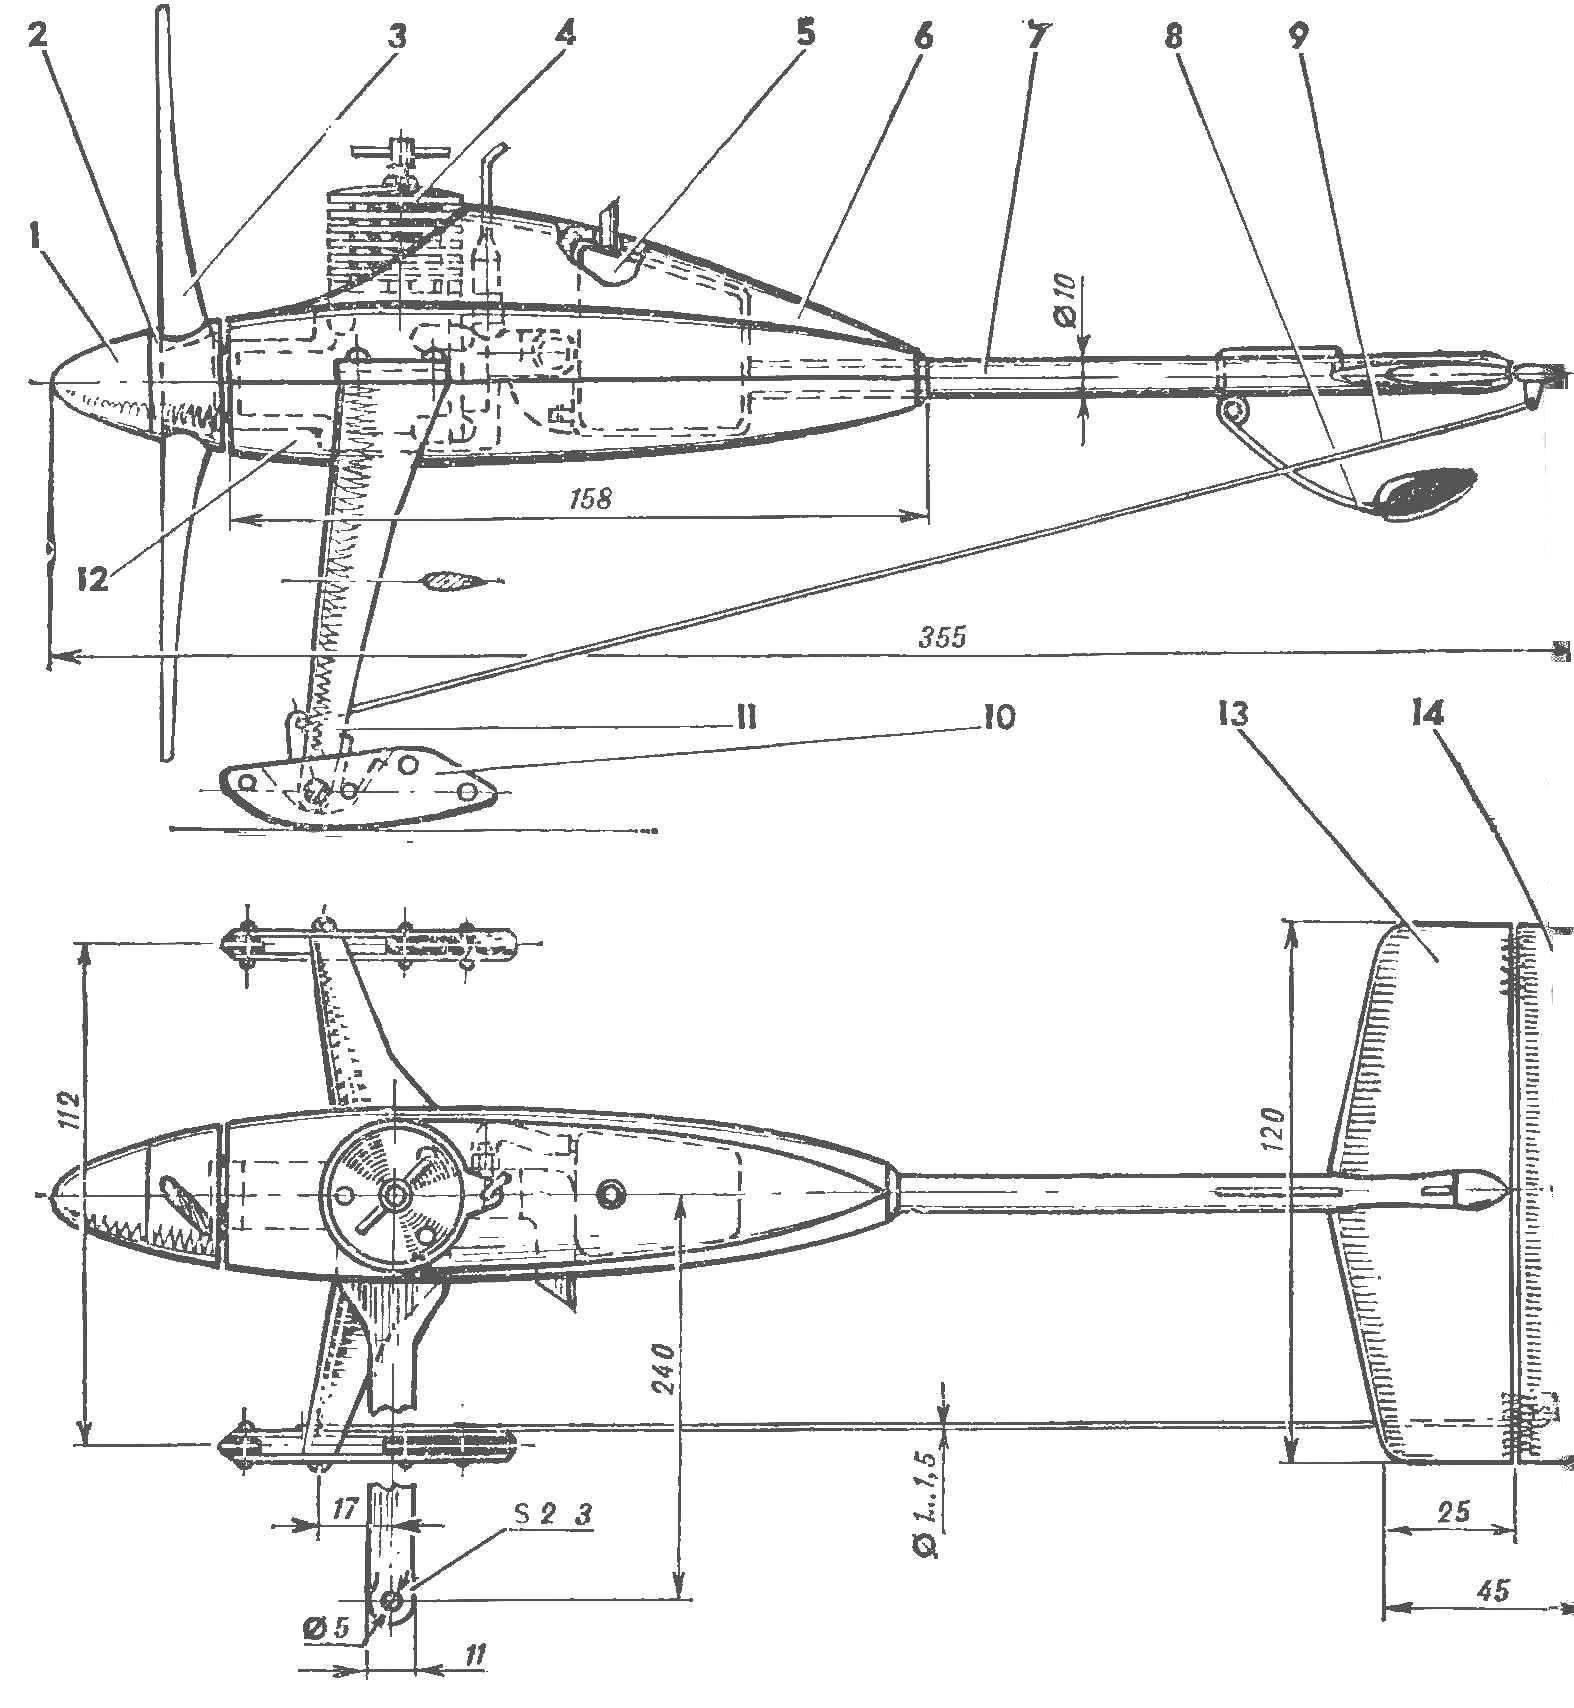 Racing control line model planes